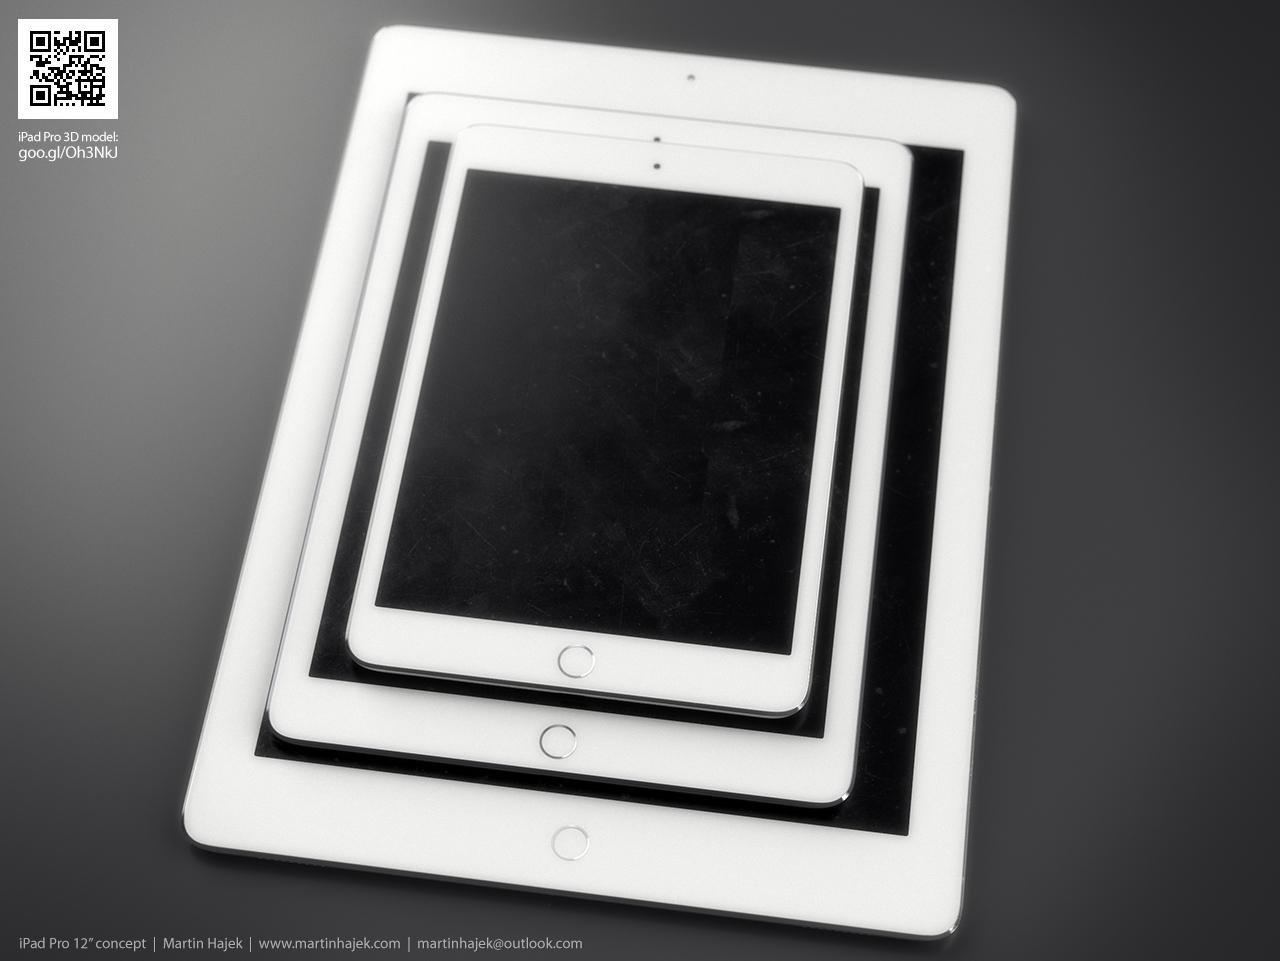 ipad-pro-air-plus-rendus-3d-03